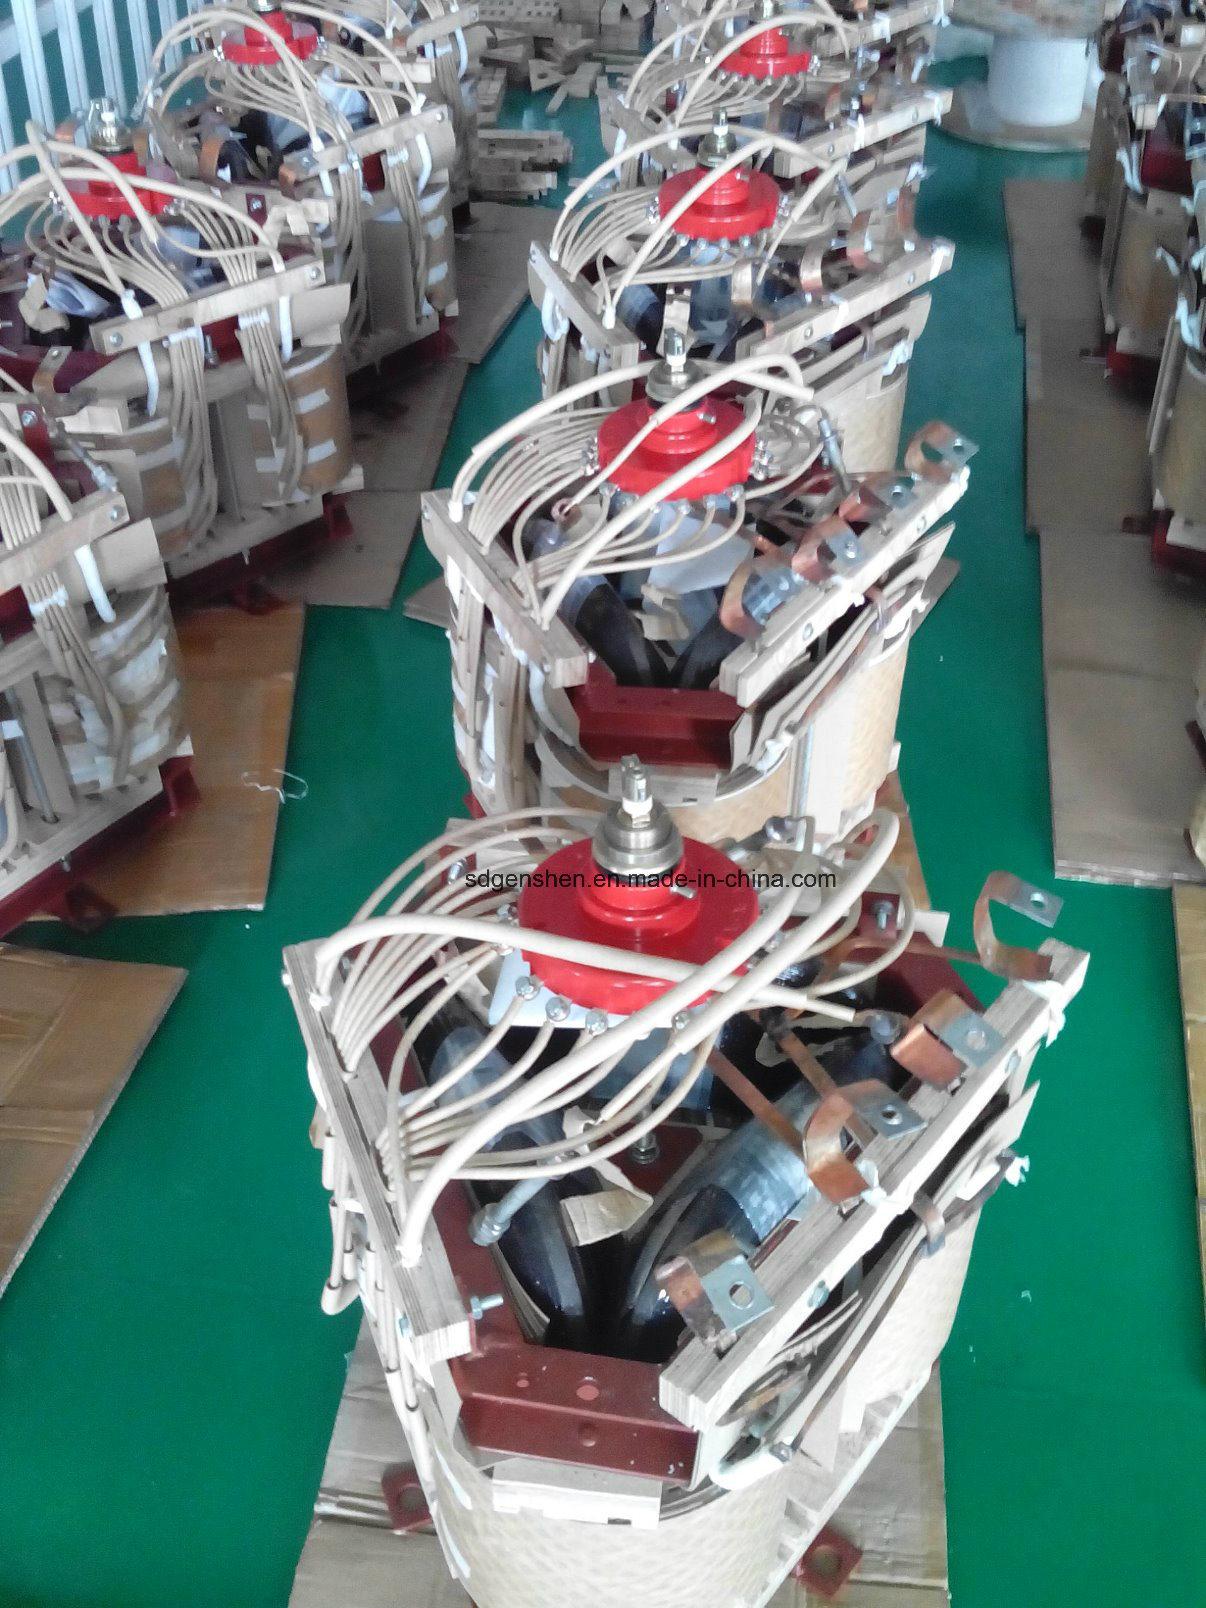 European Outdoor Box Type Transformer Substation/Power Transformer Distribution Substation